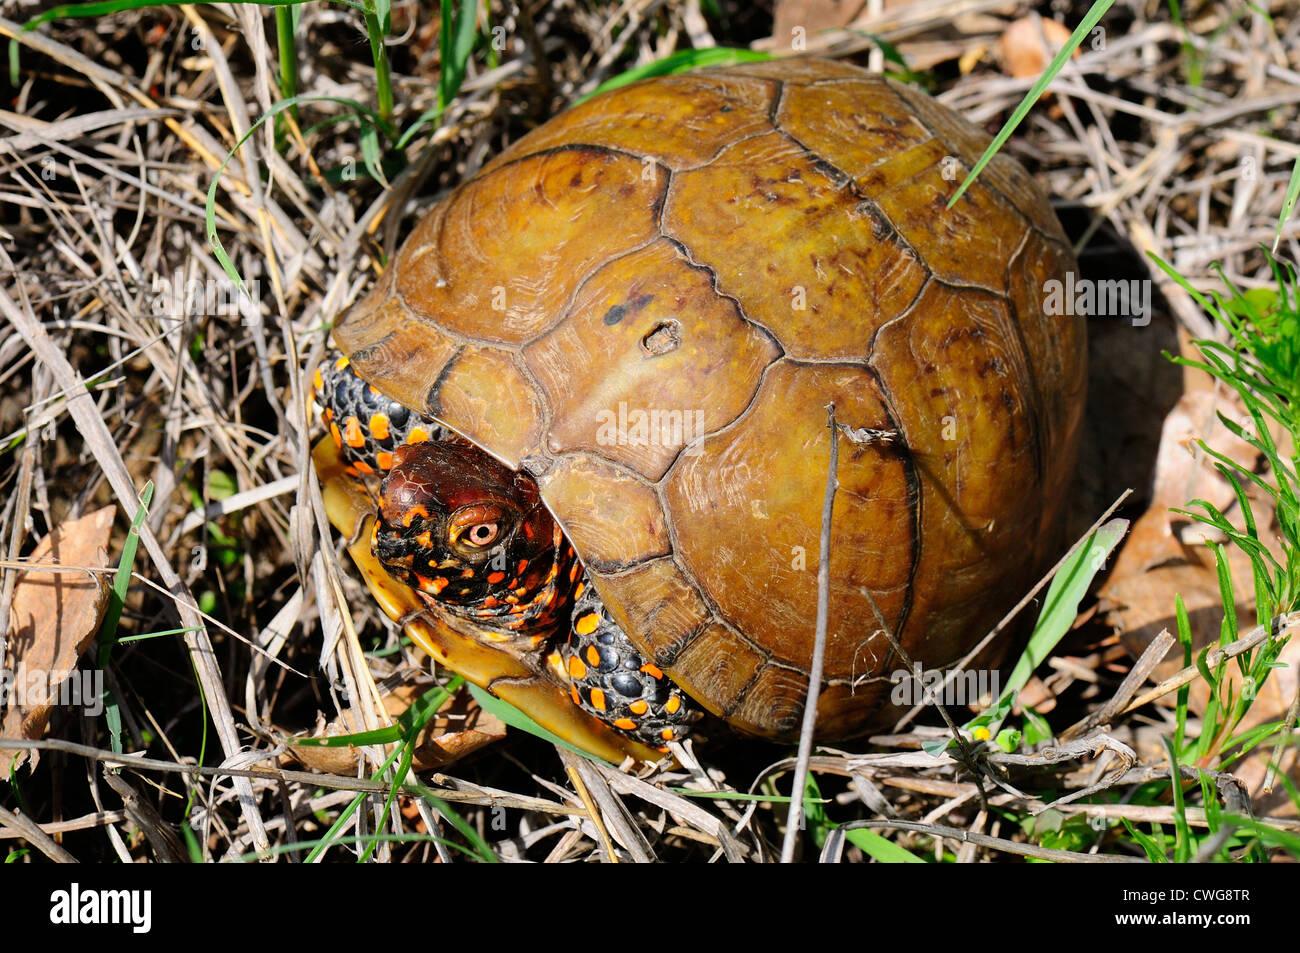 Three-toed box turtle - Stock Image